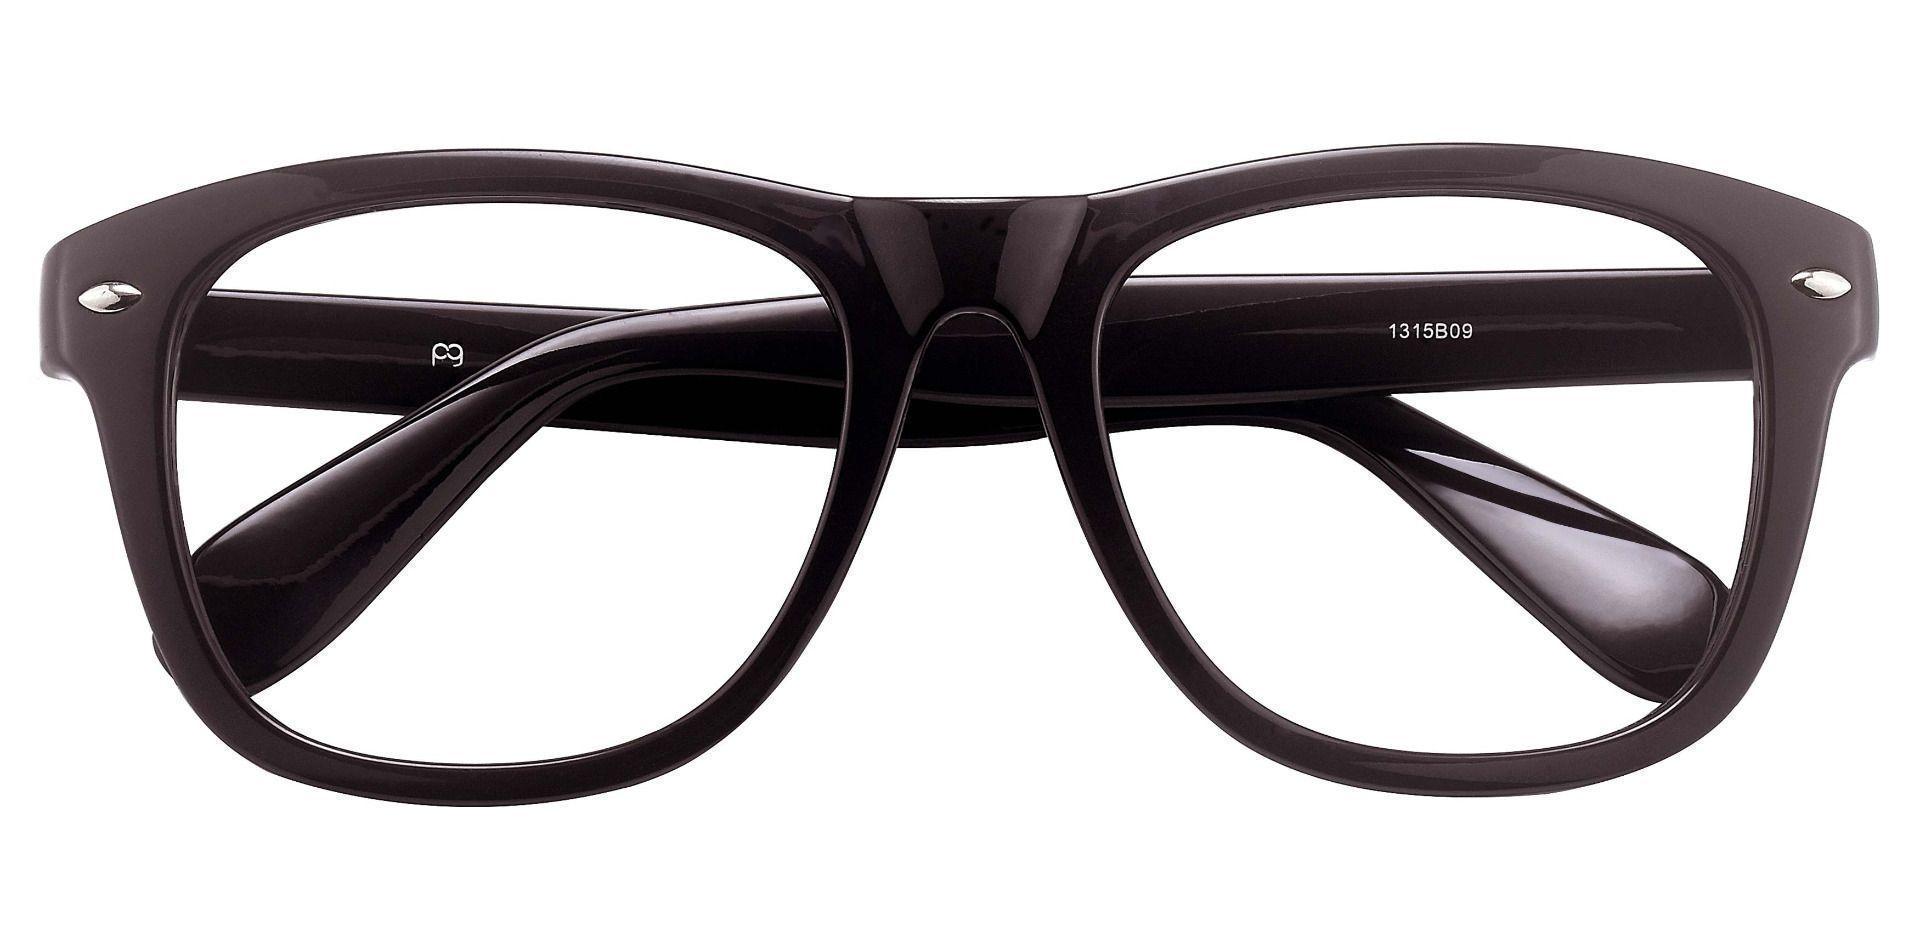 Yolanda Square Lined Bifocal Glasses - Brown